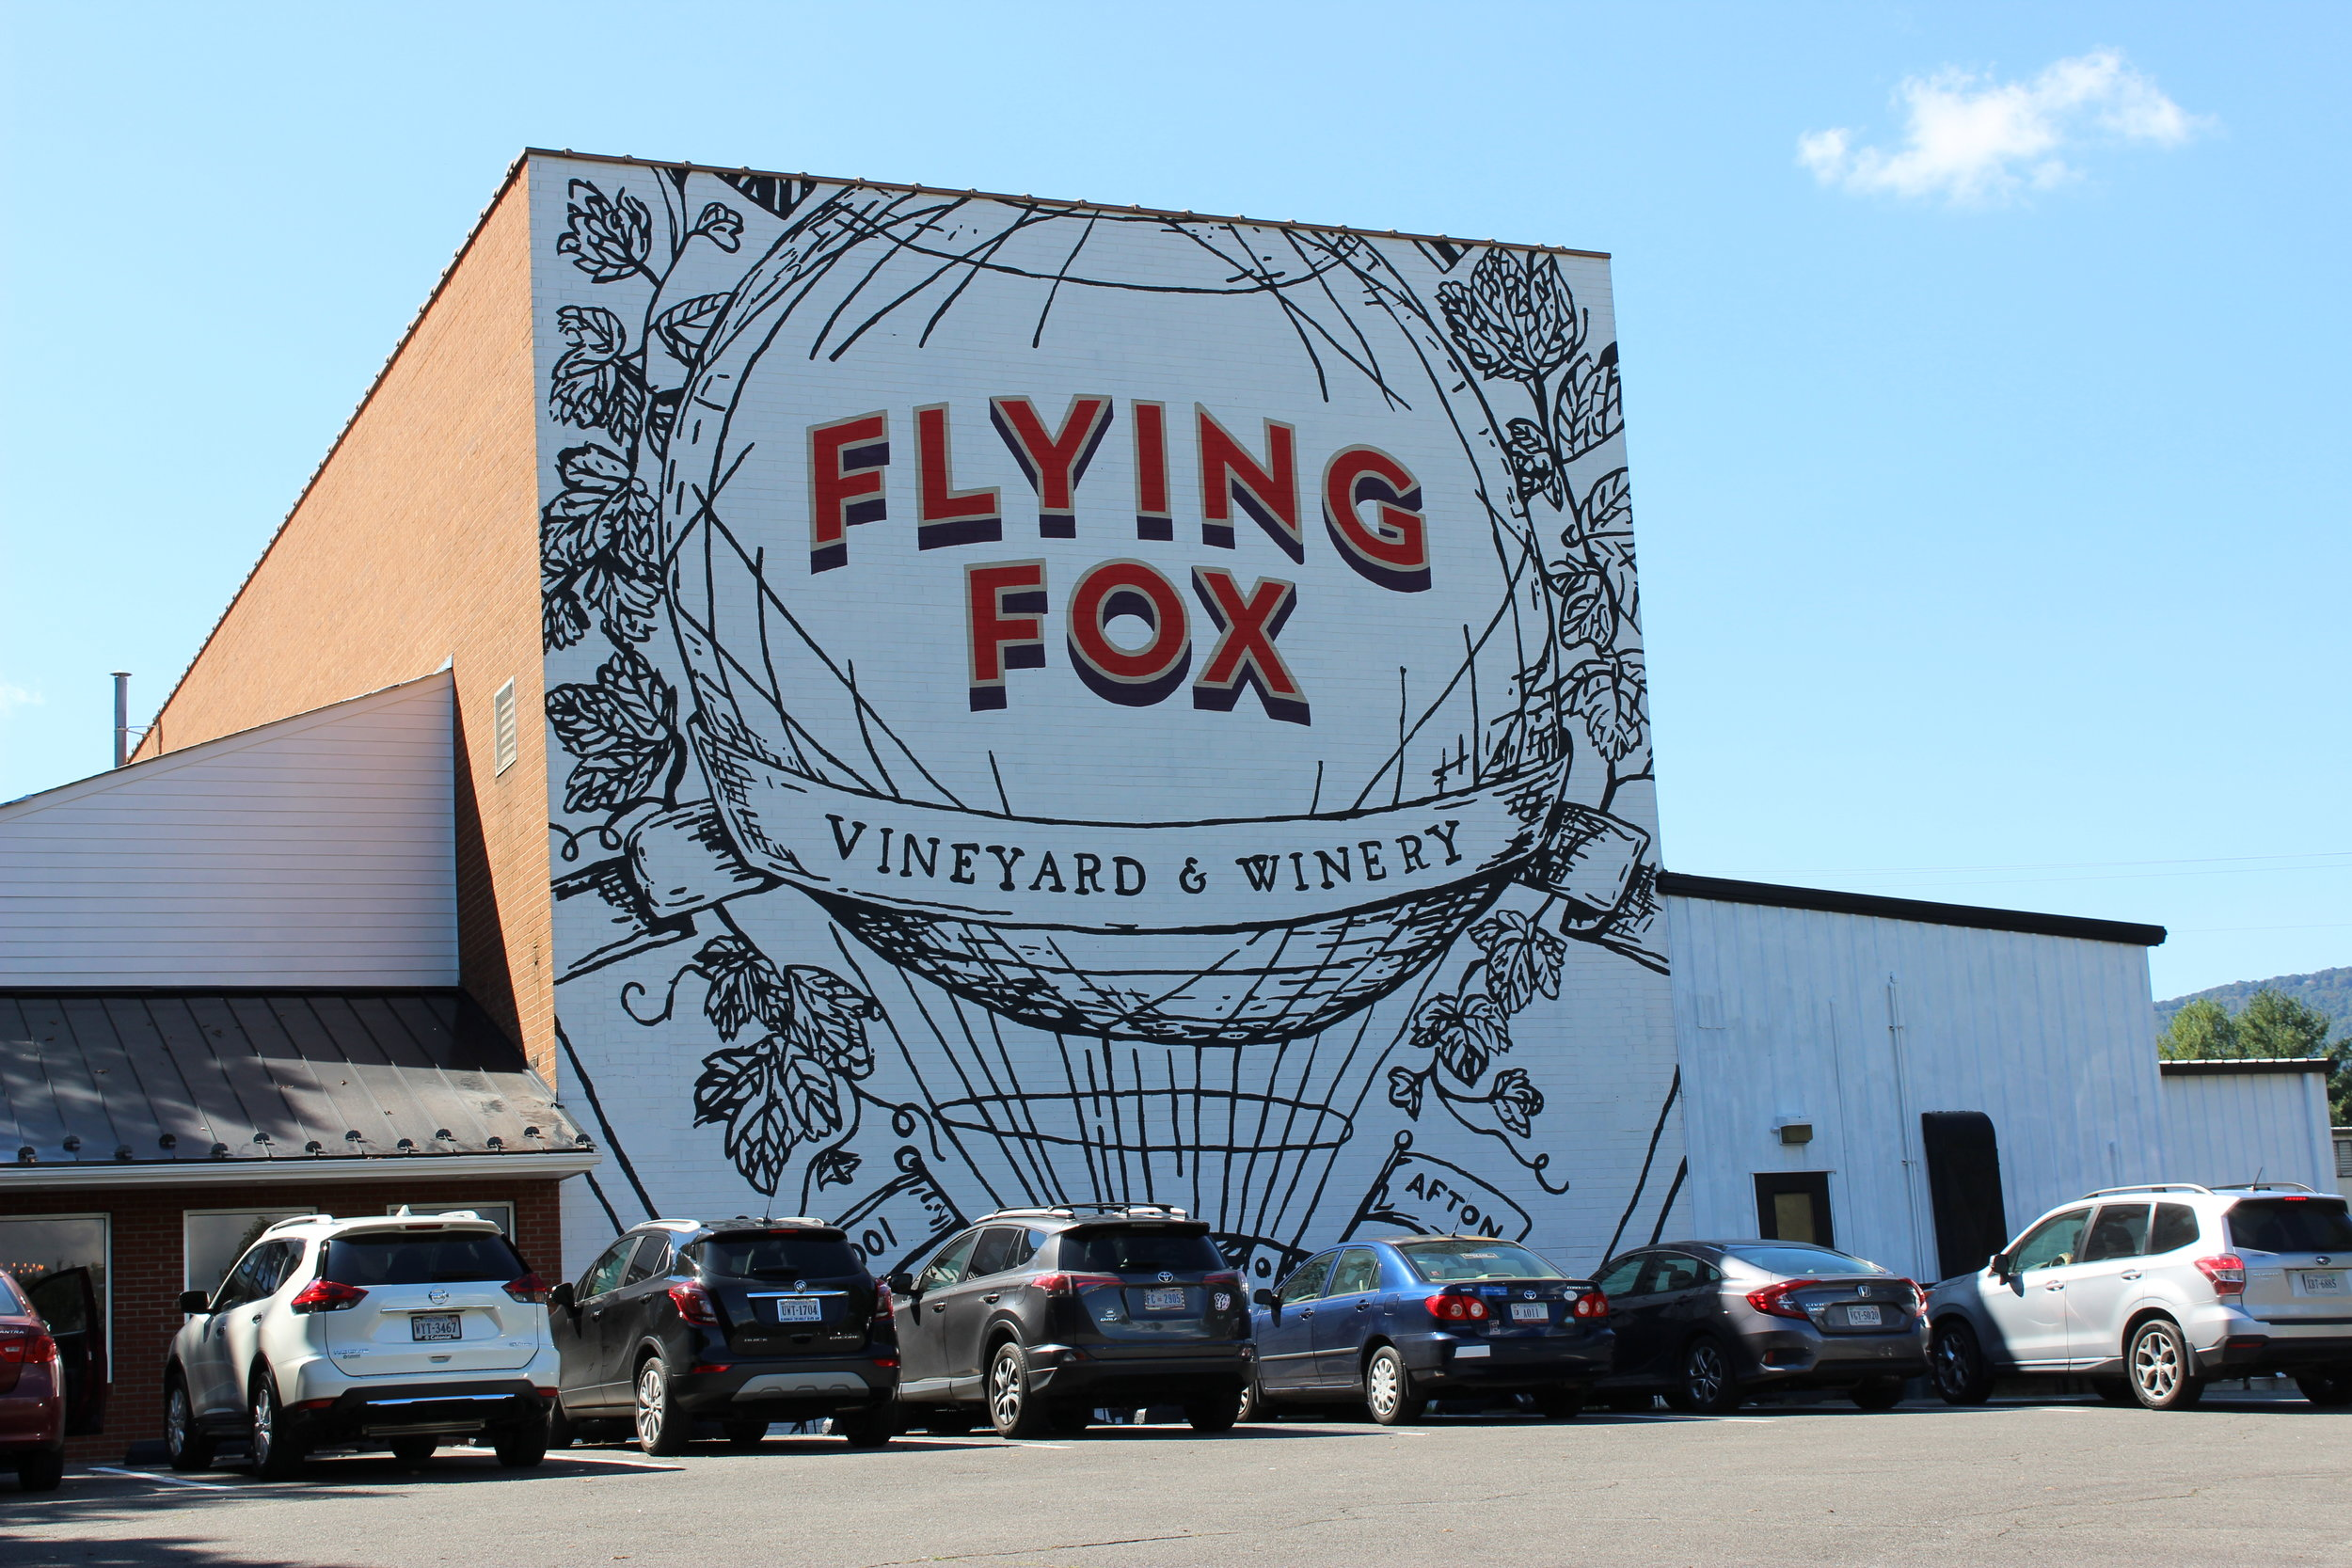 Flying Fox Vineyard